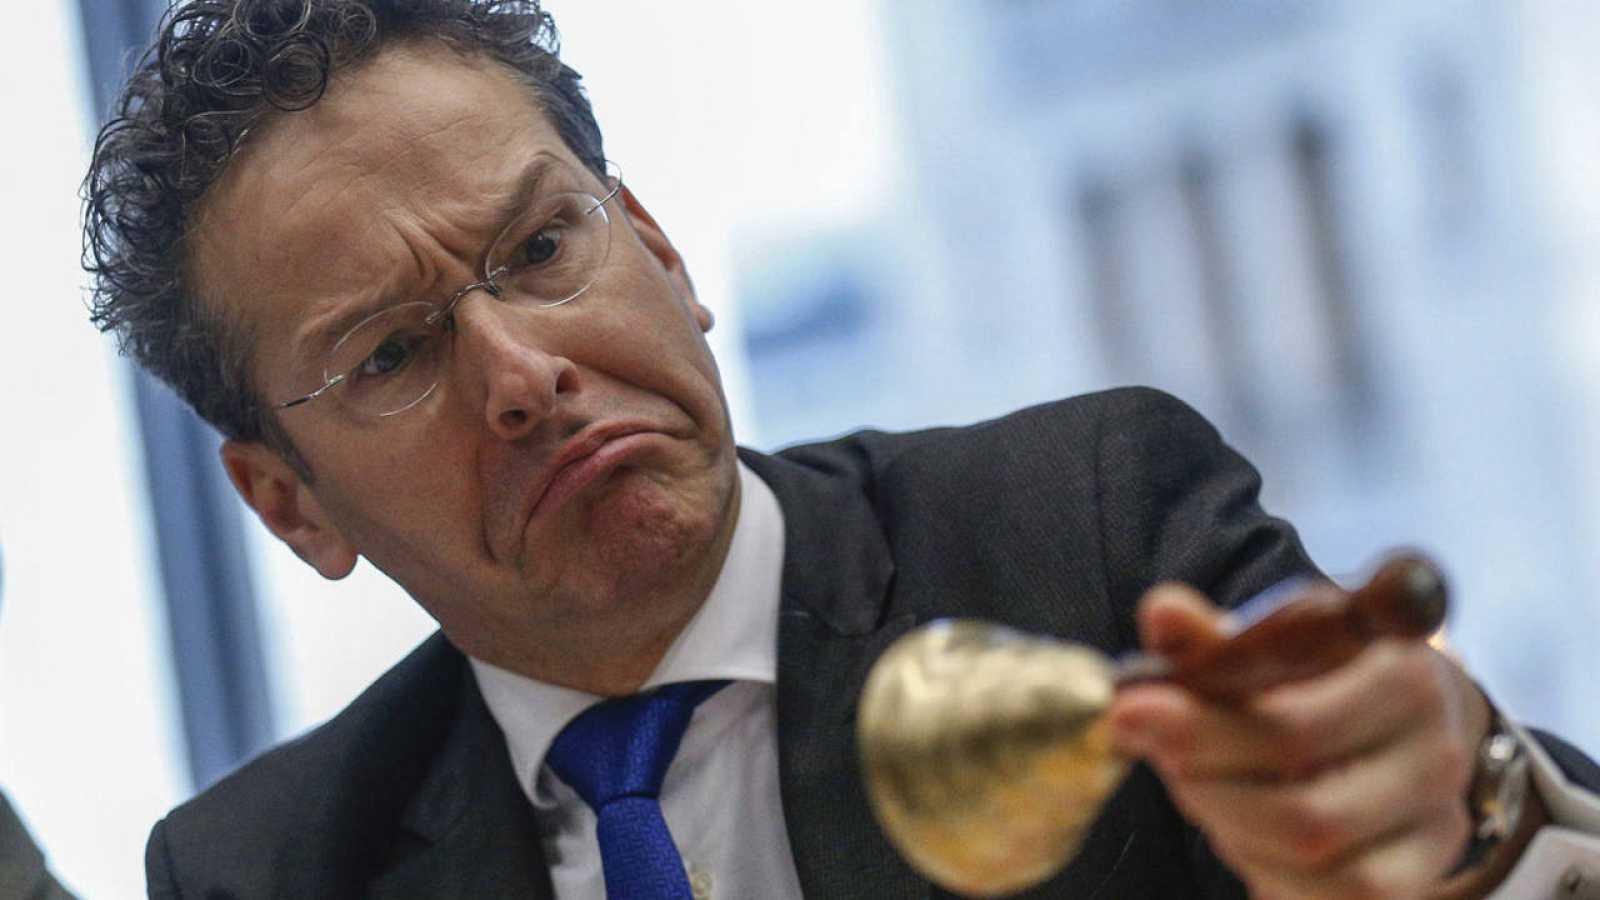 El presidente del Eurogrupo, Jeroen Dijsselbloem, observa una campanilla